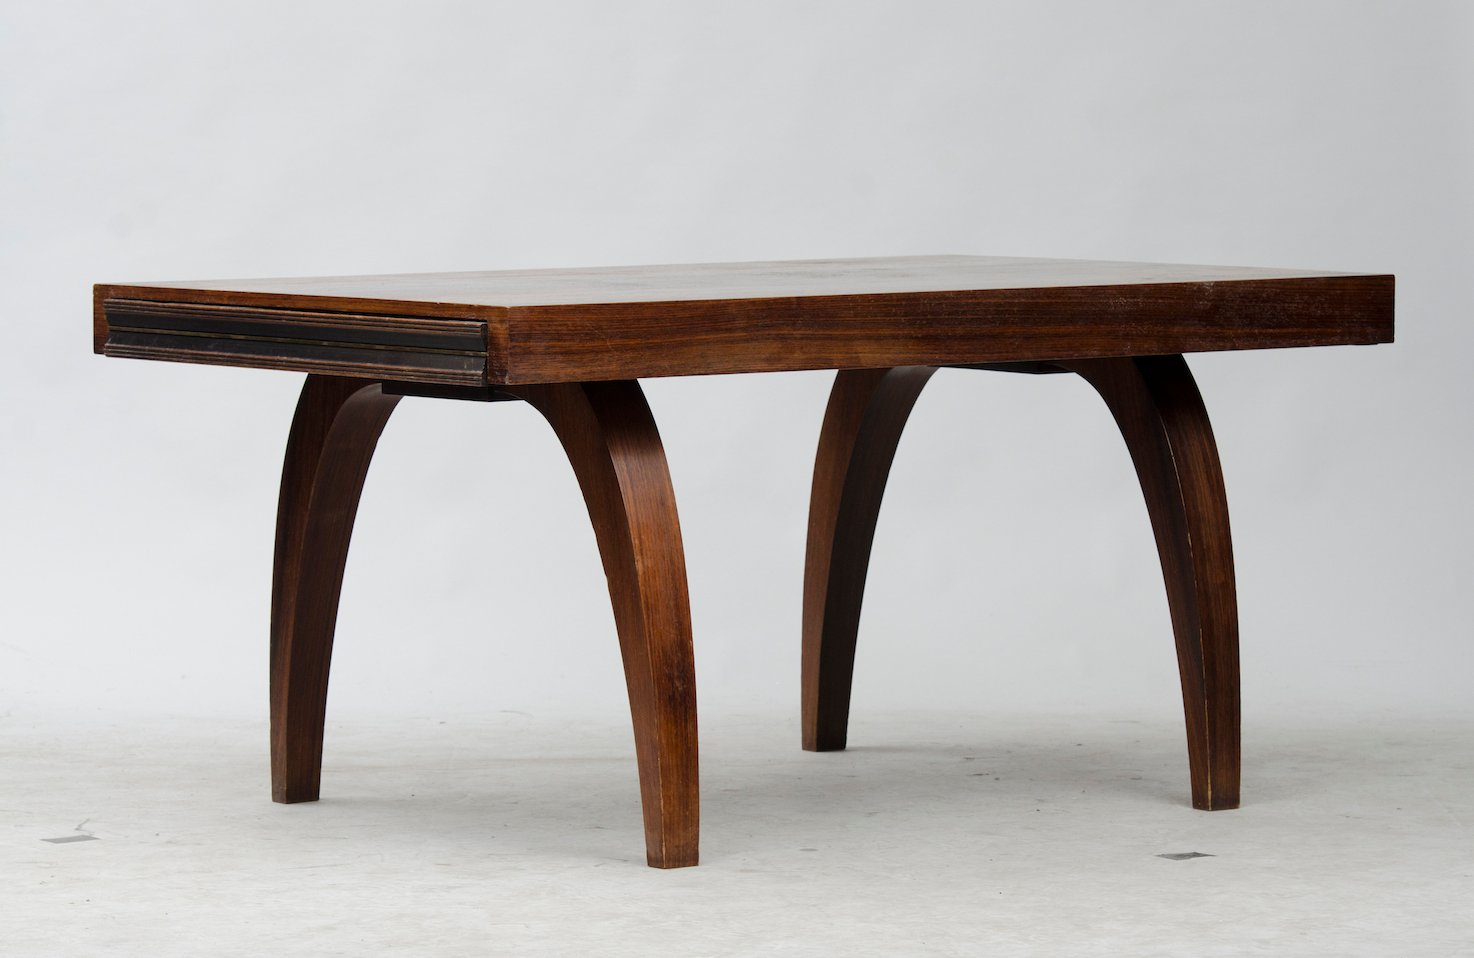 Vintage Art Deco Dining Table for sale at Pamono : vintage art deco dining table 2 from www.pamono.co.uk size 1474 x 958 jpeg 588kB